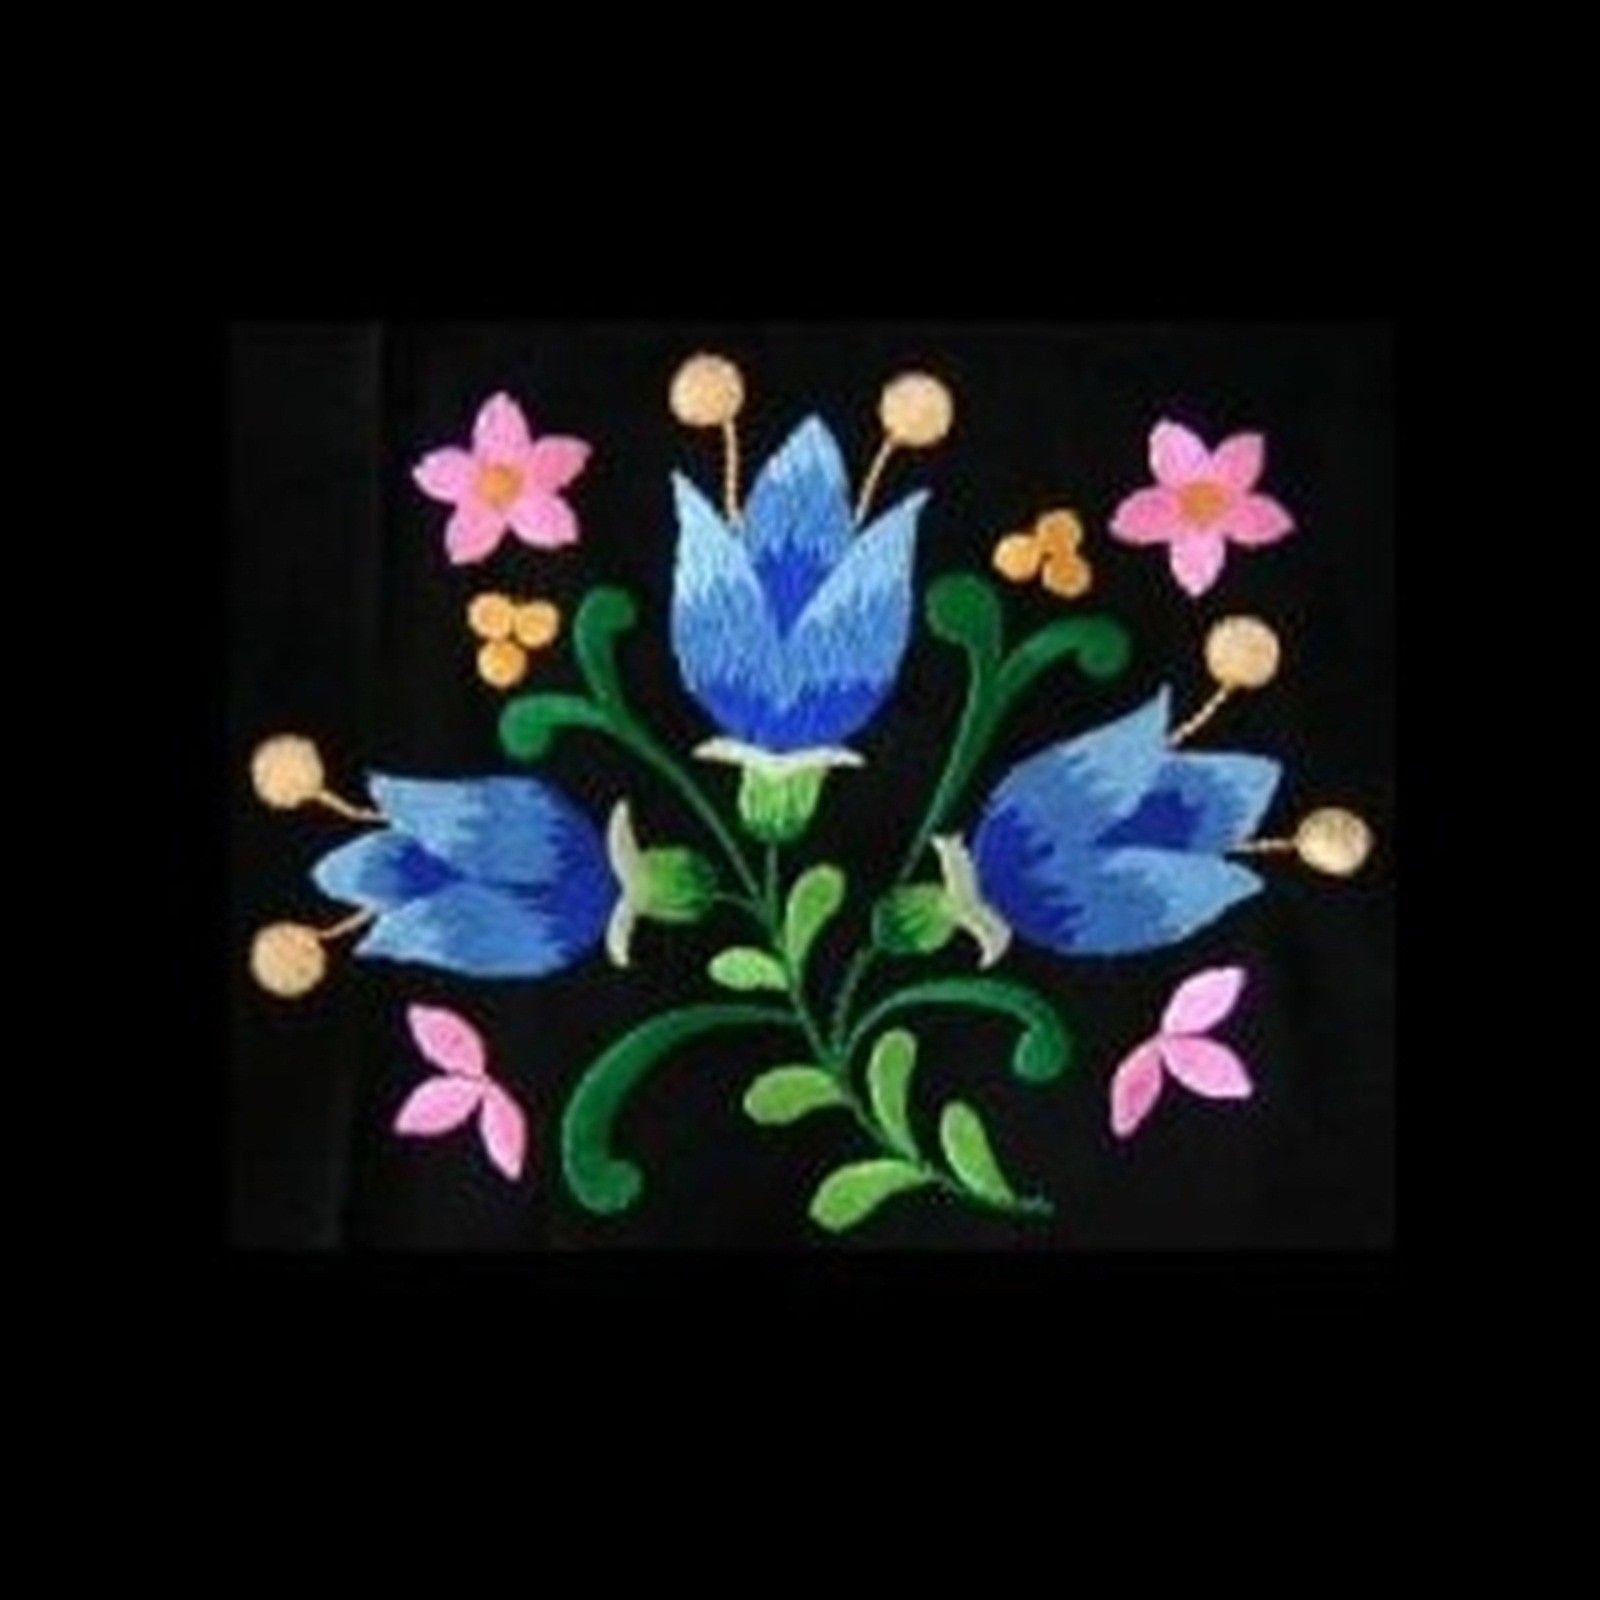 German folk art machine embroidery designs flowers you tell